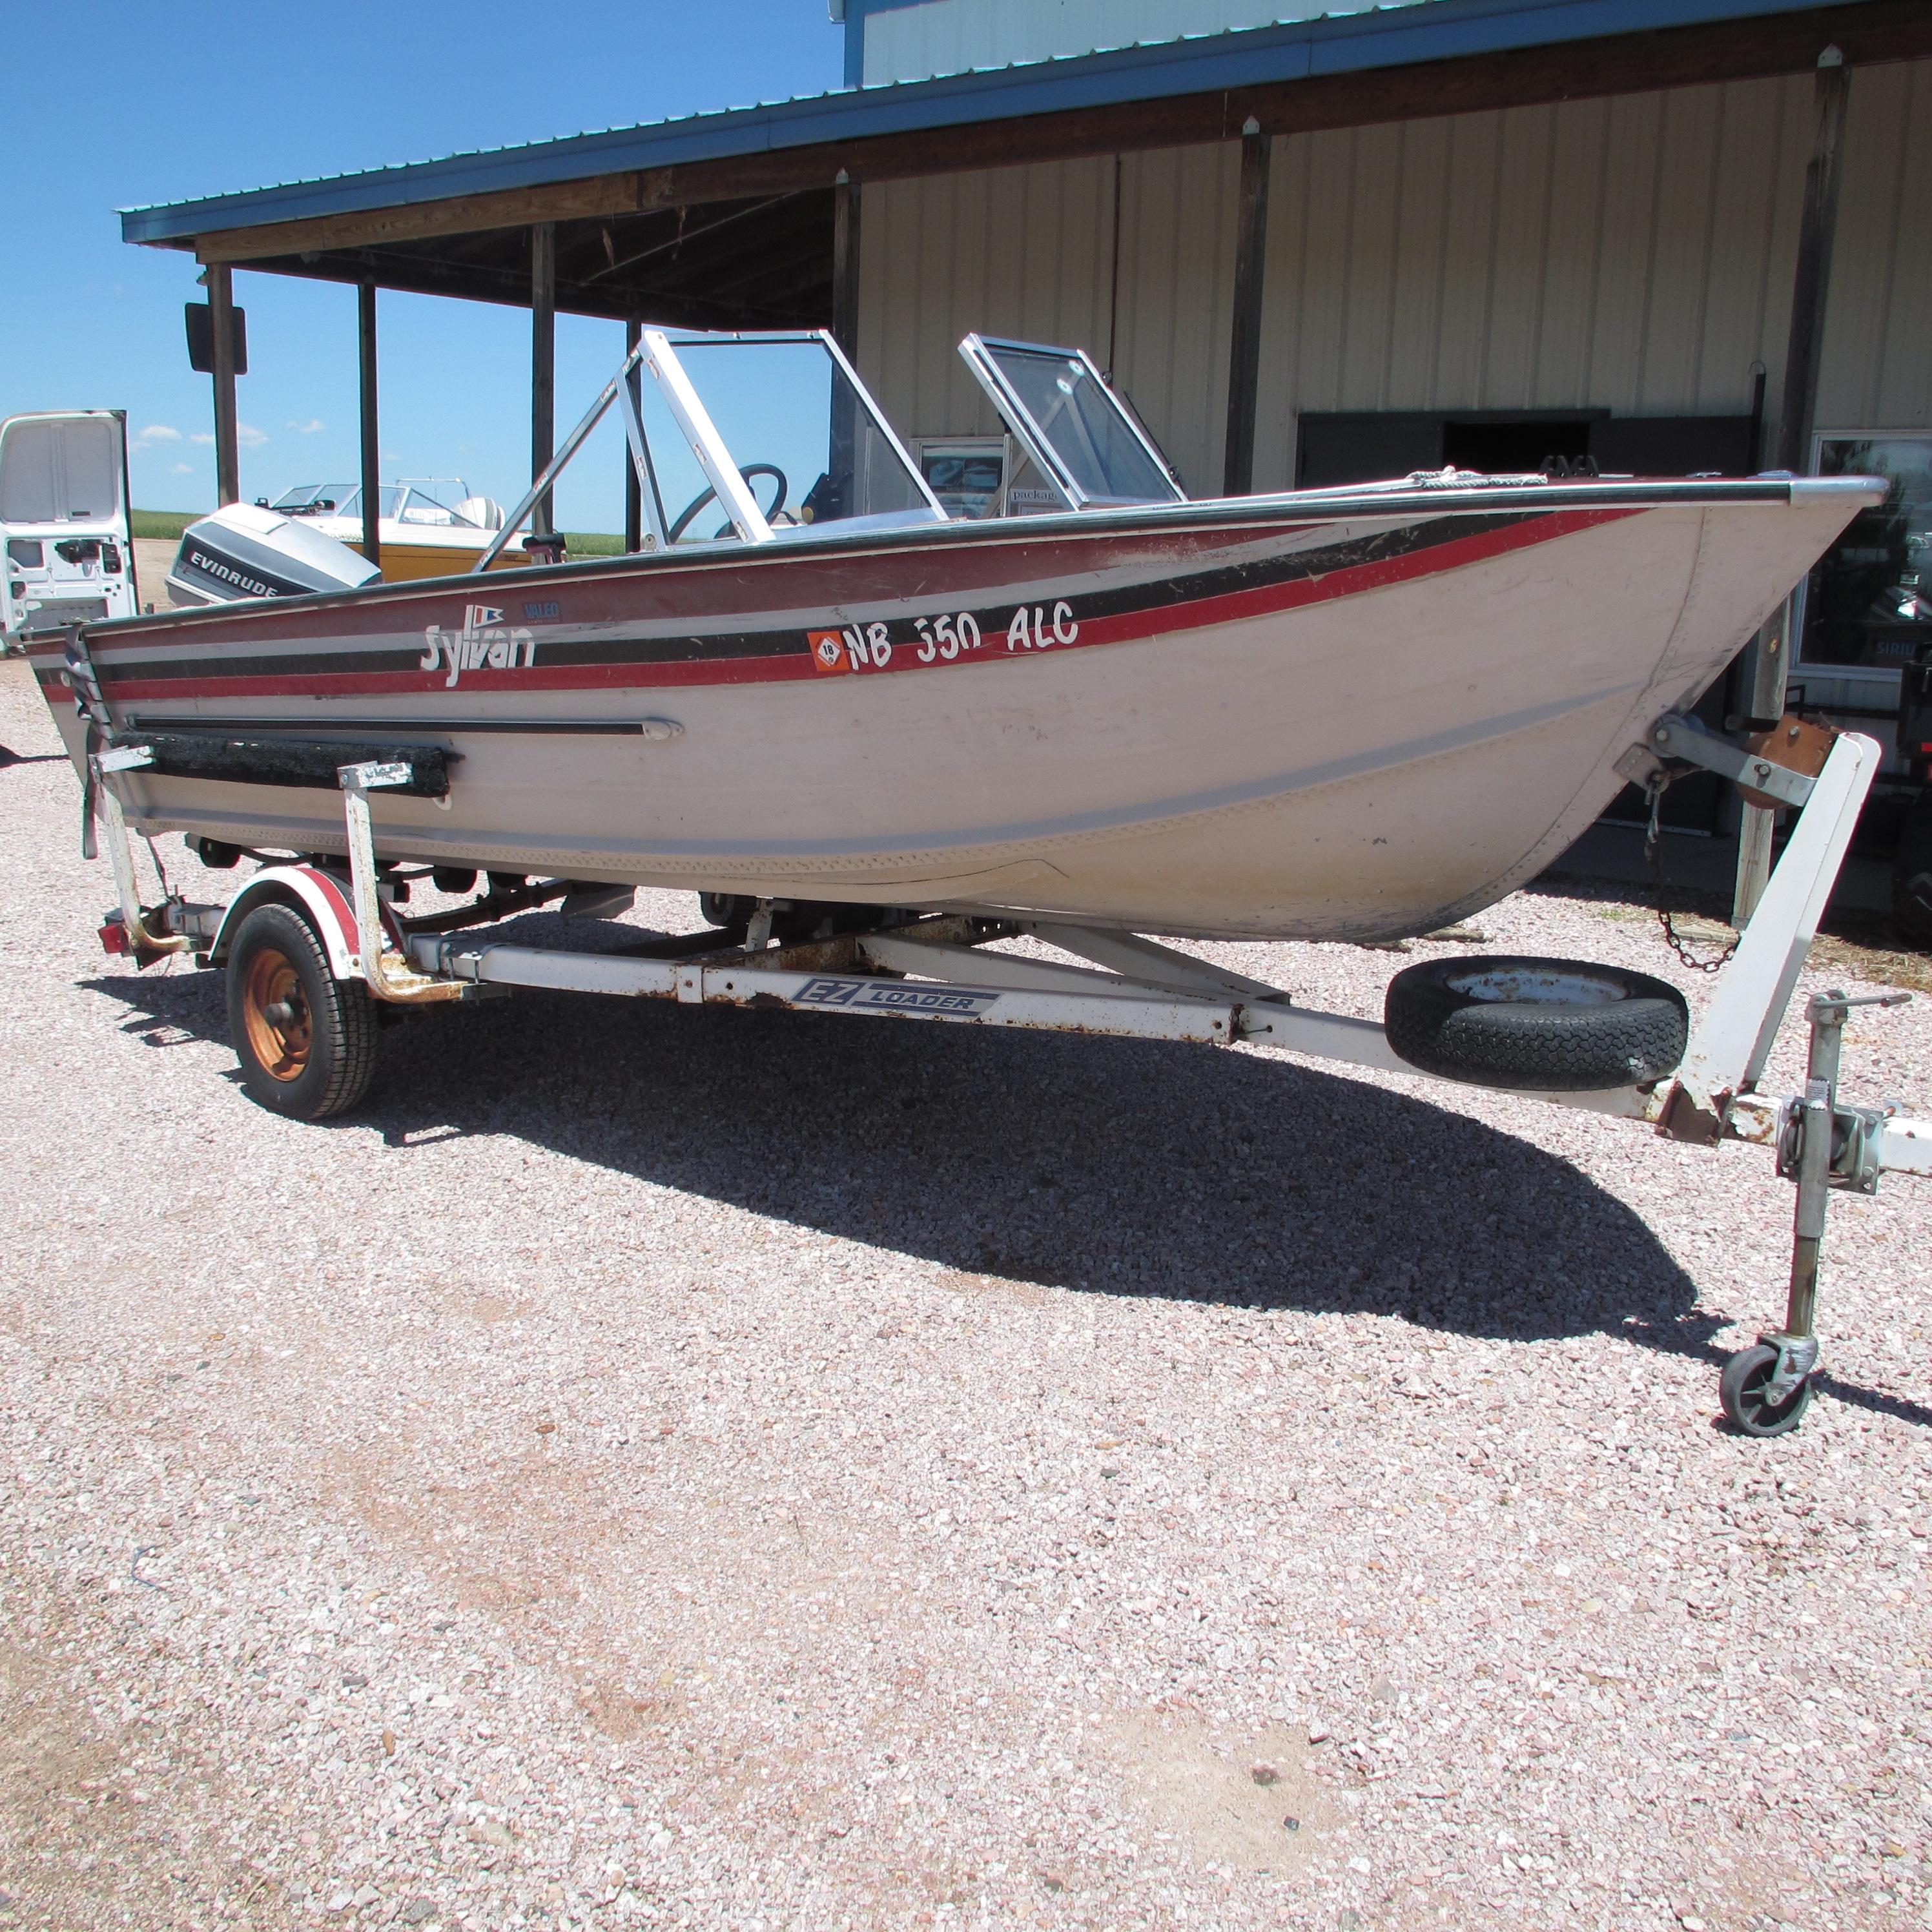 Used Boats for Sale | scubastevestoys